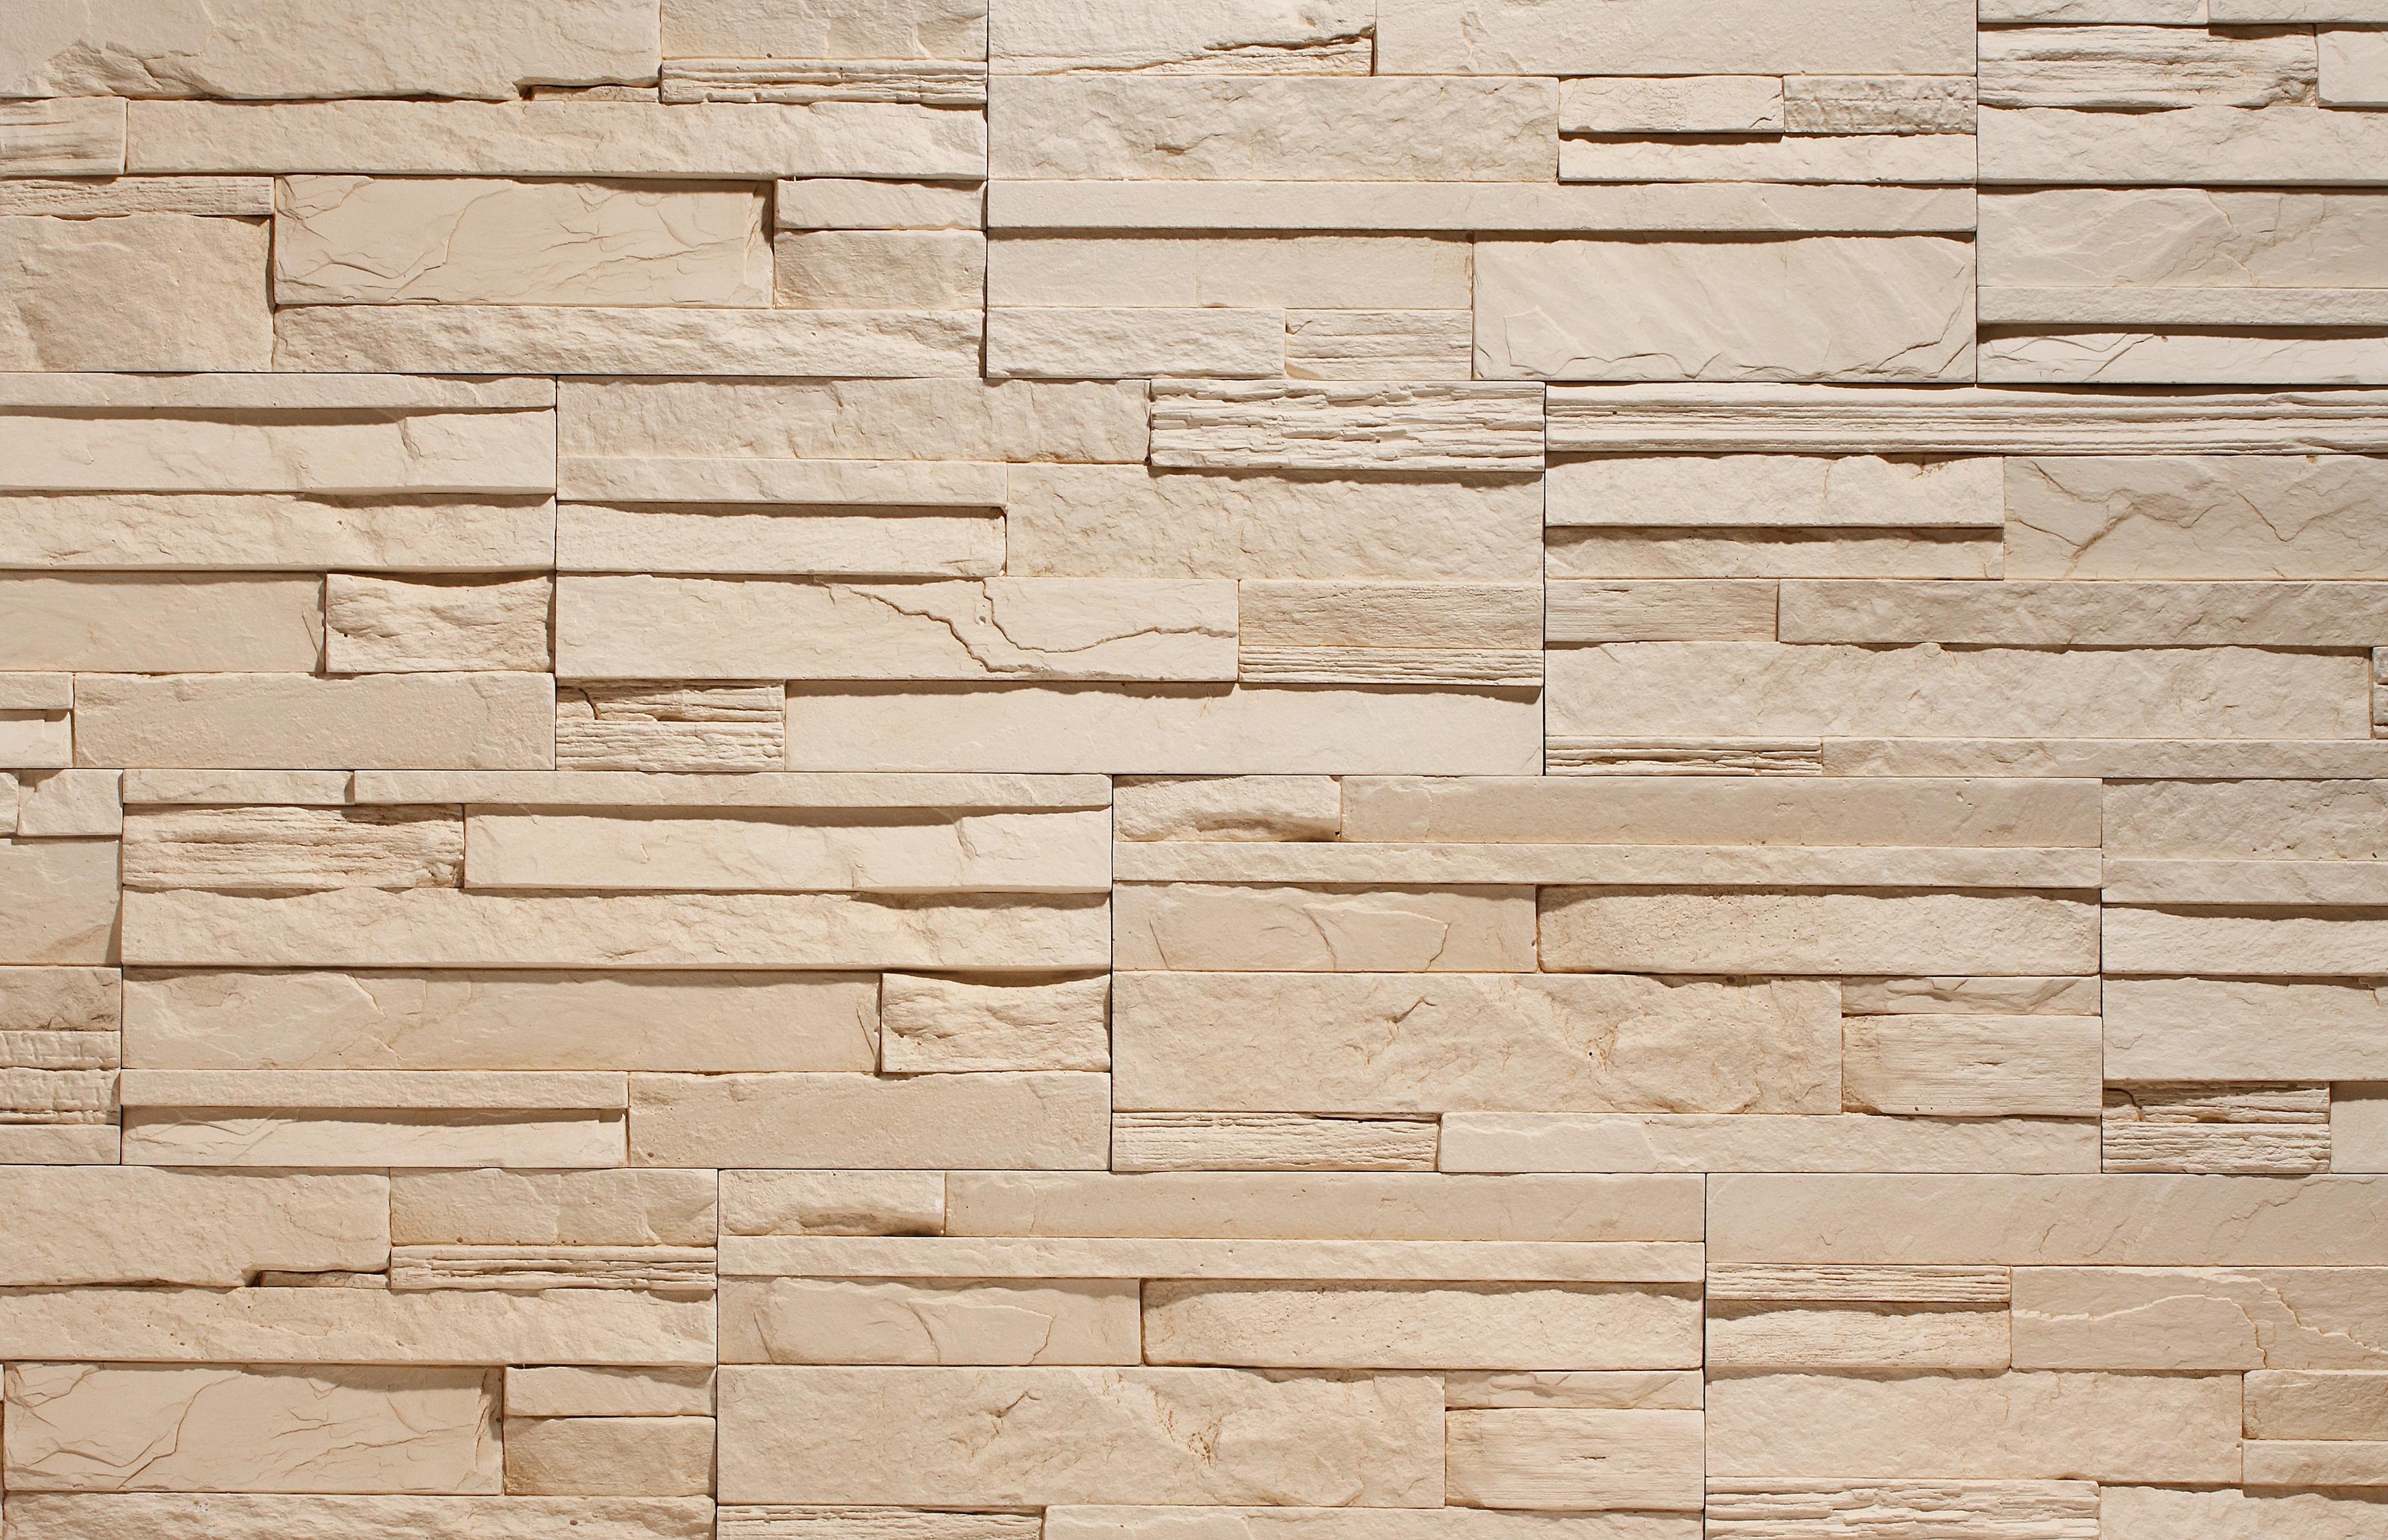 CELINA KLINKER Packung: Verblendsteine »Creta« | Baumarkt > Wand und Decke > Verblendsteine | CELINA KLINKER